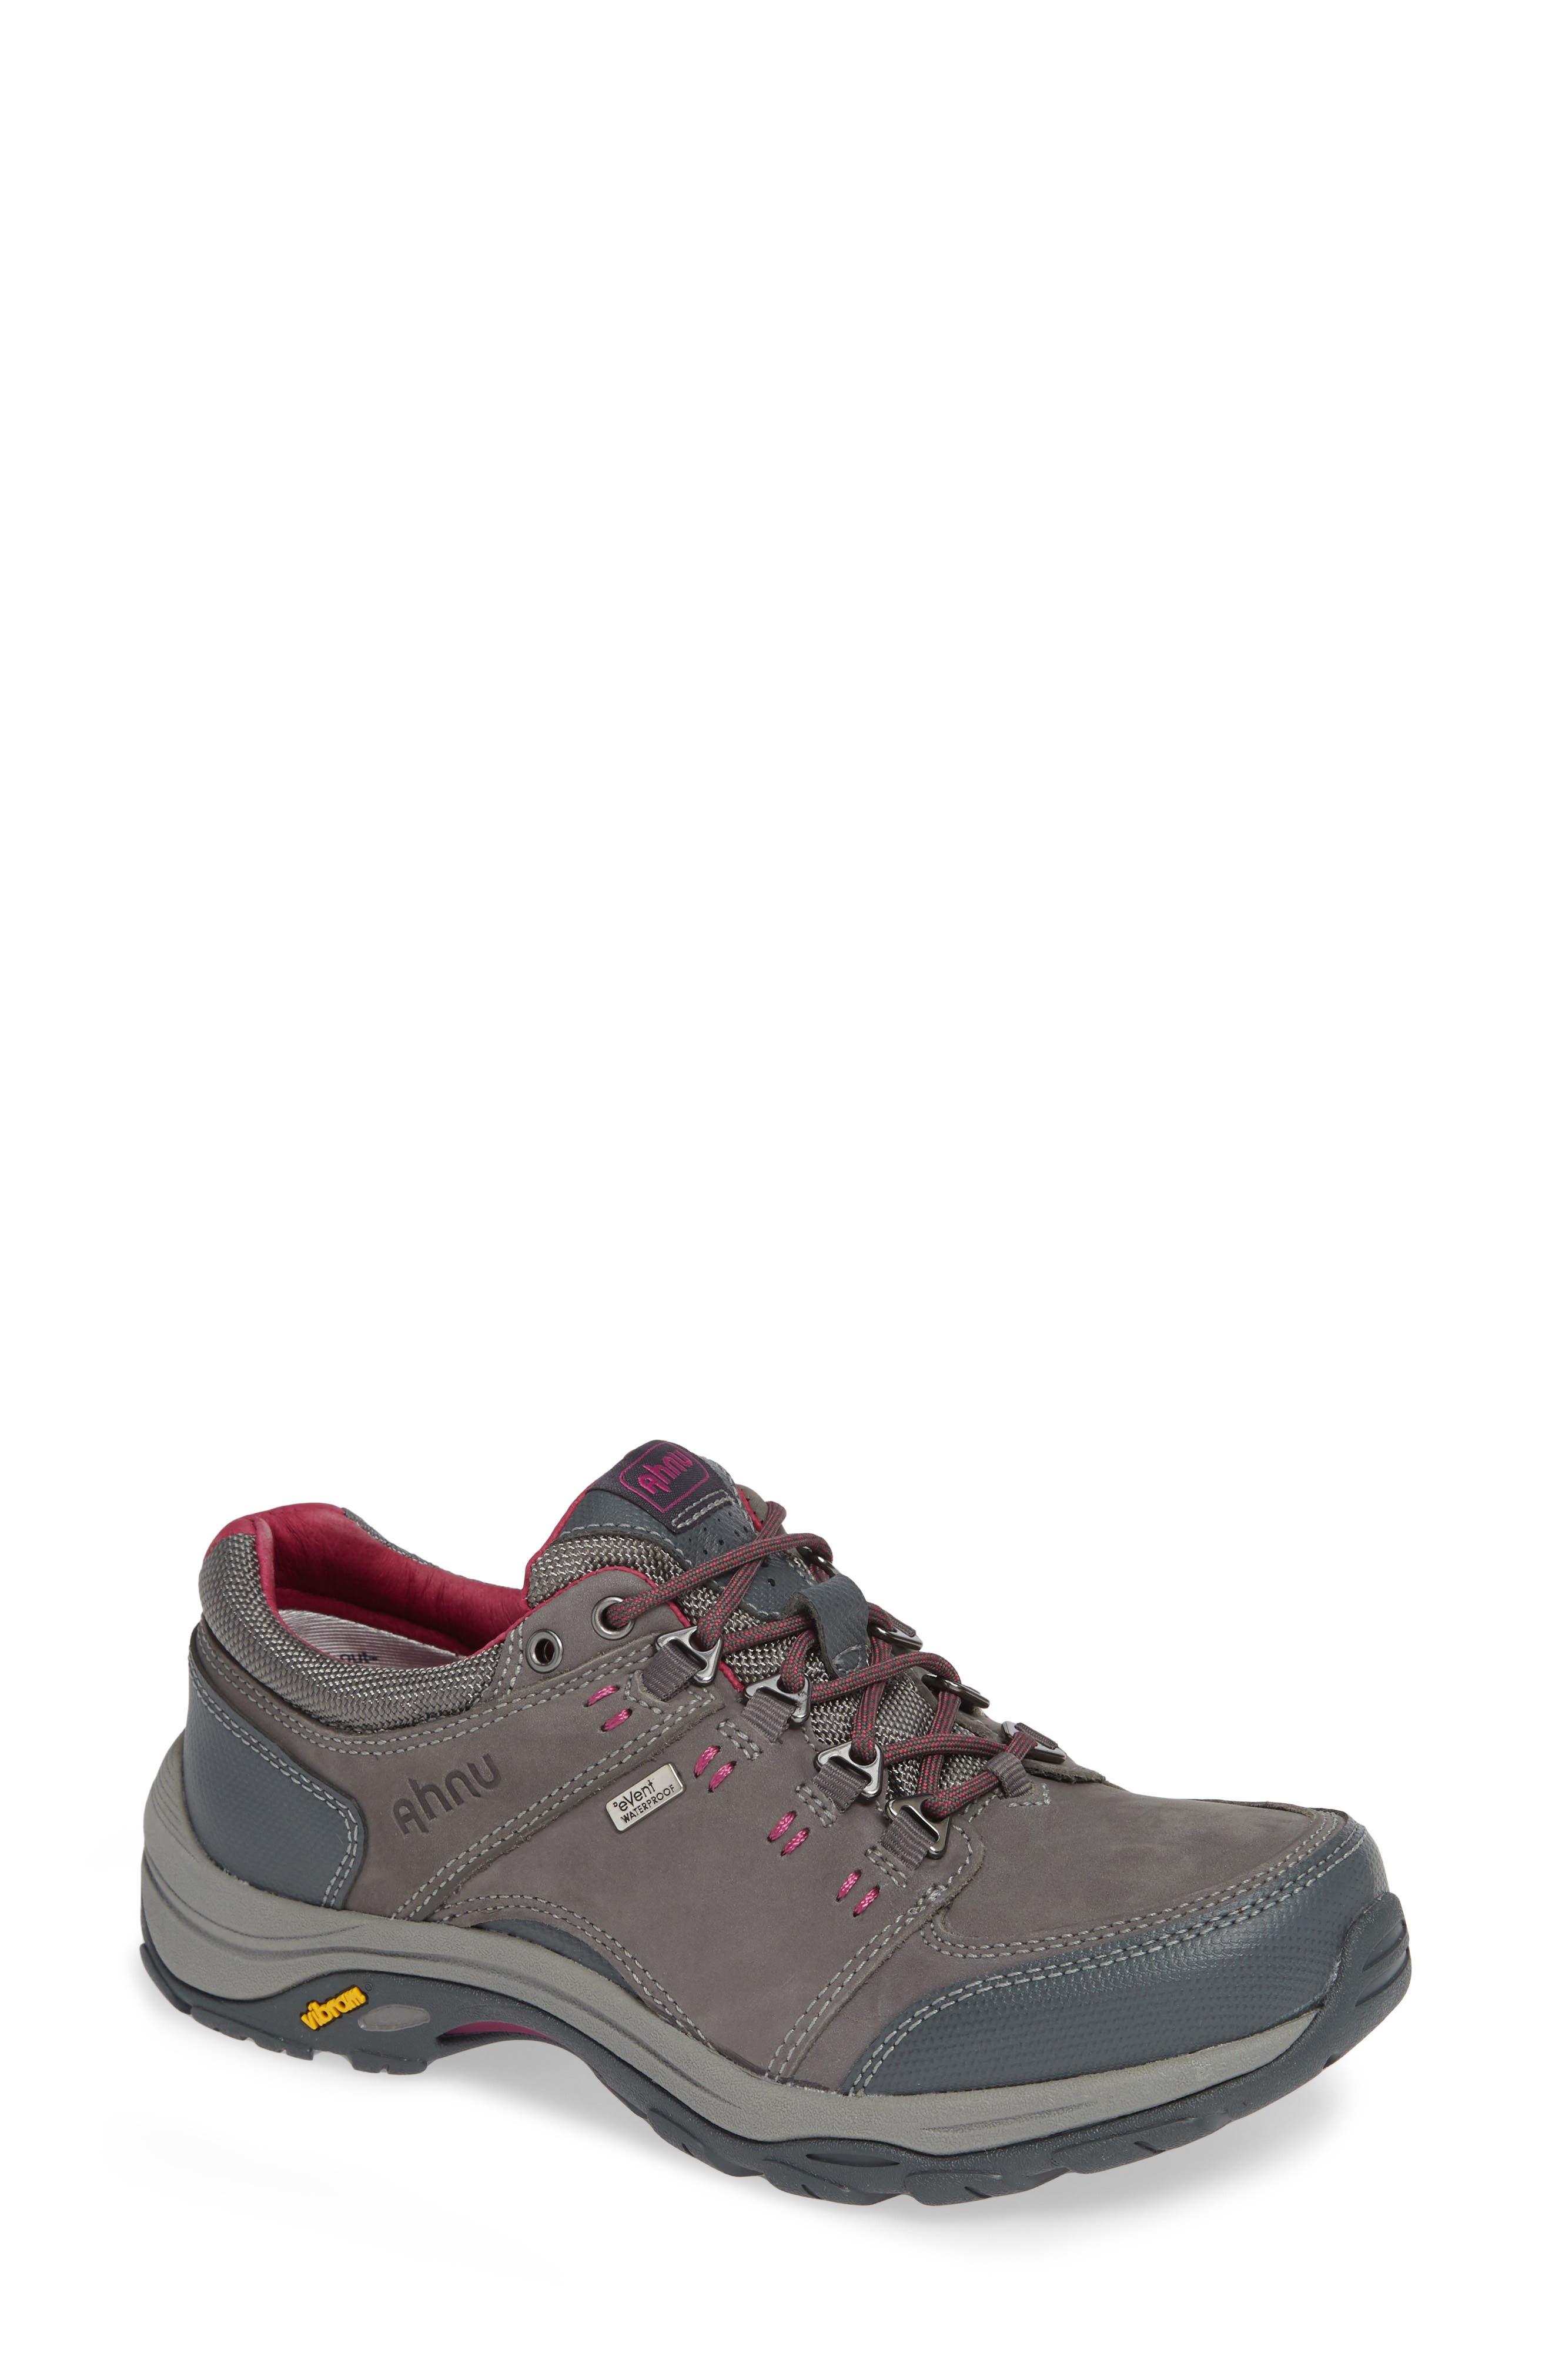 TEVA,                             Ahnu by Teva Montara III Waterproof Hiking Sneaker,                             Main thumbnail 1, color,                             CHARCOAL GRAY NUBUCK LEATHER